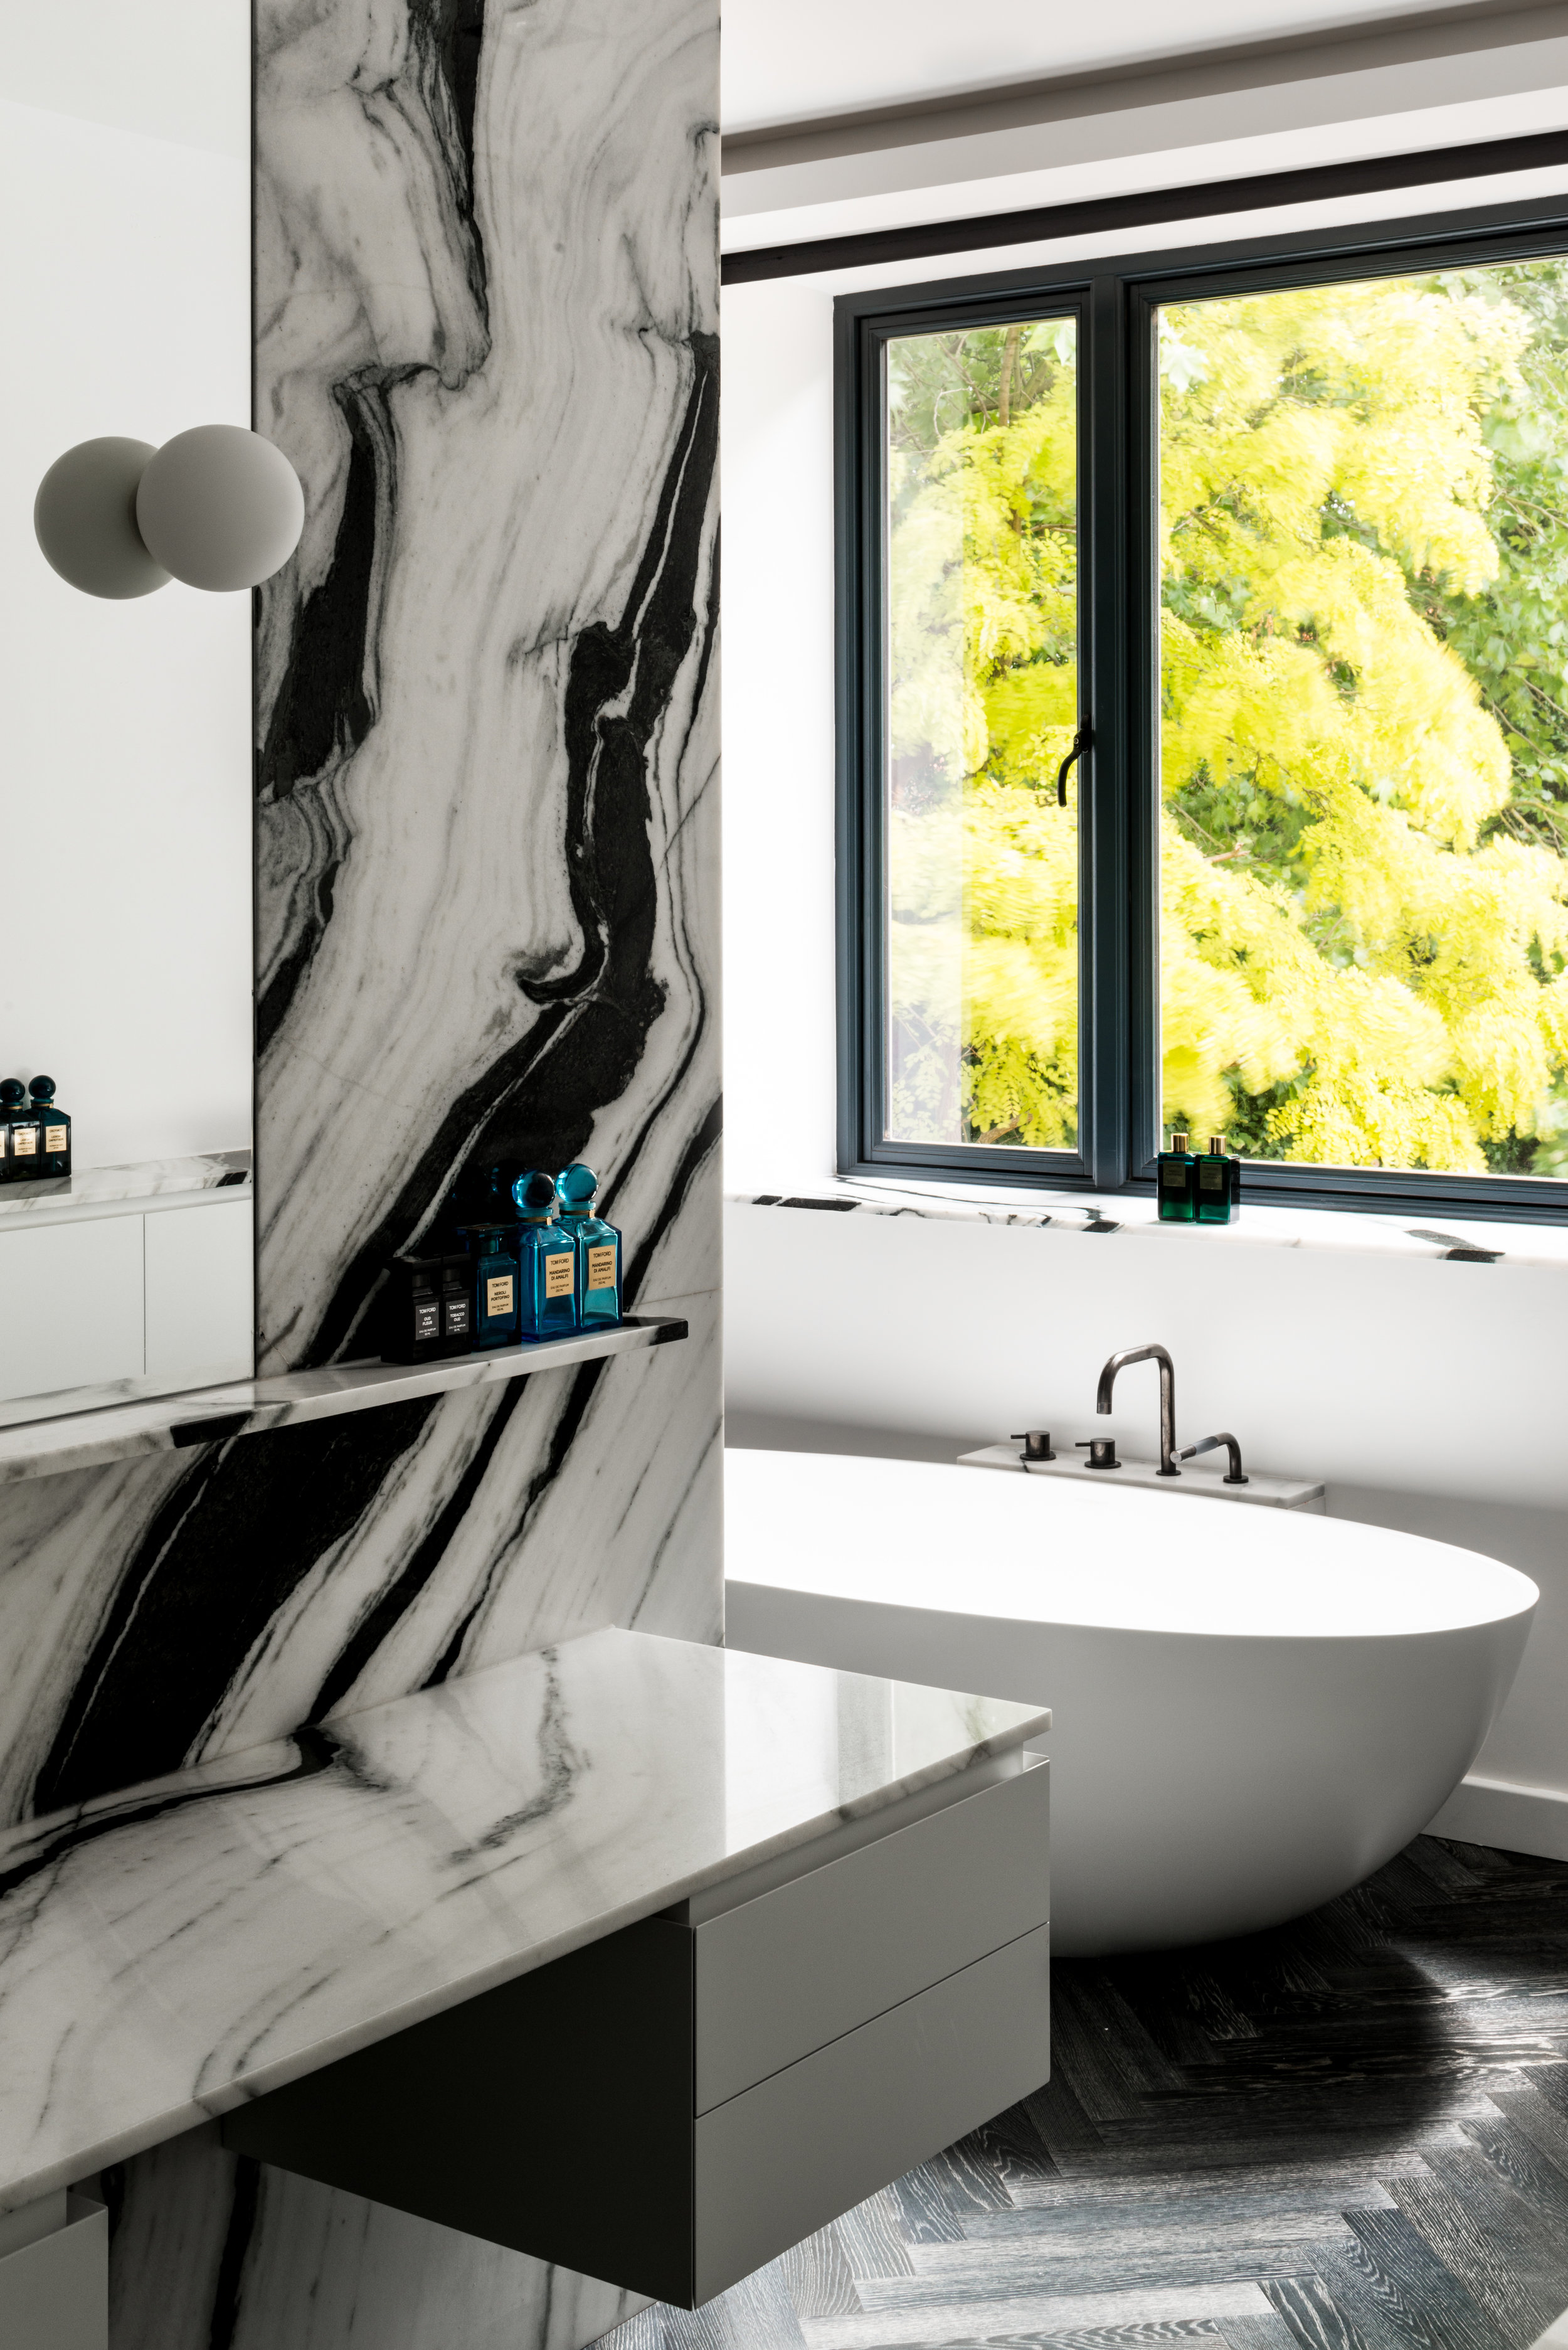 Luxury Bathroom Design Awards 2018 - MW Architects